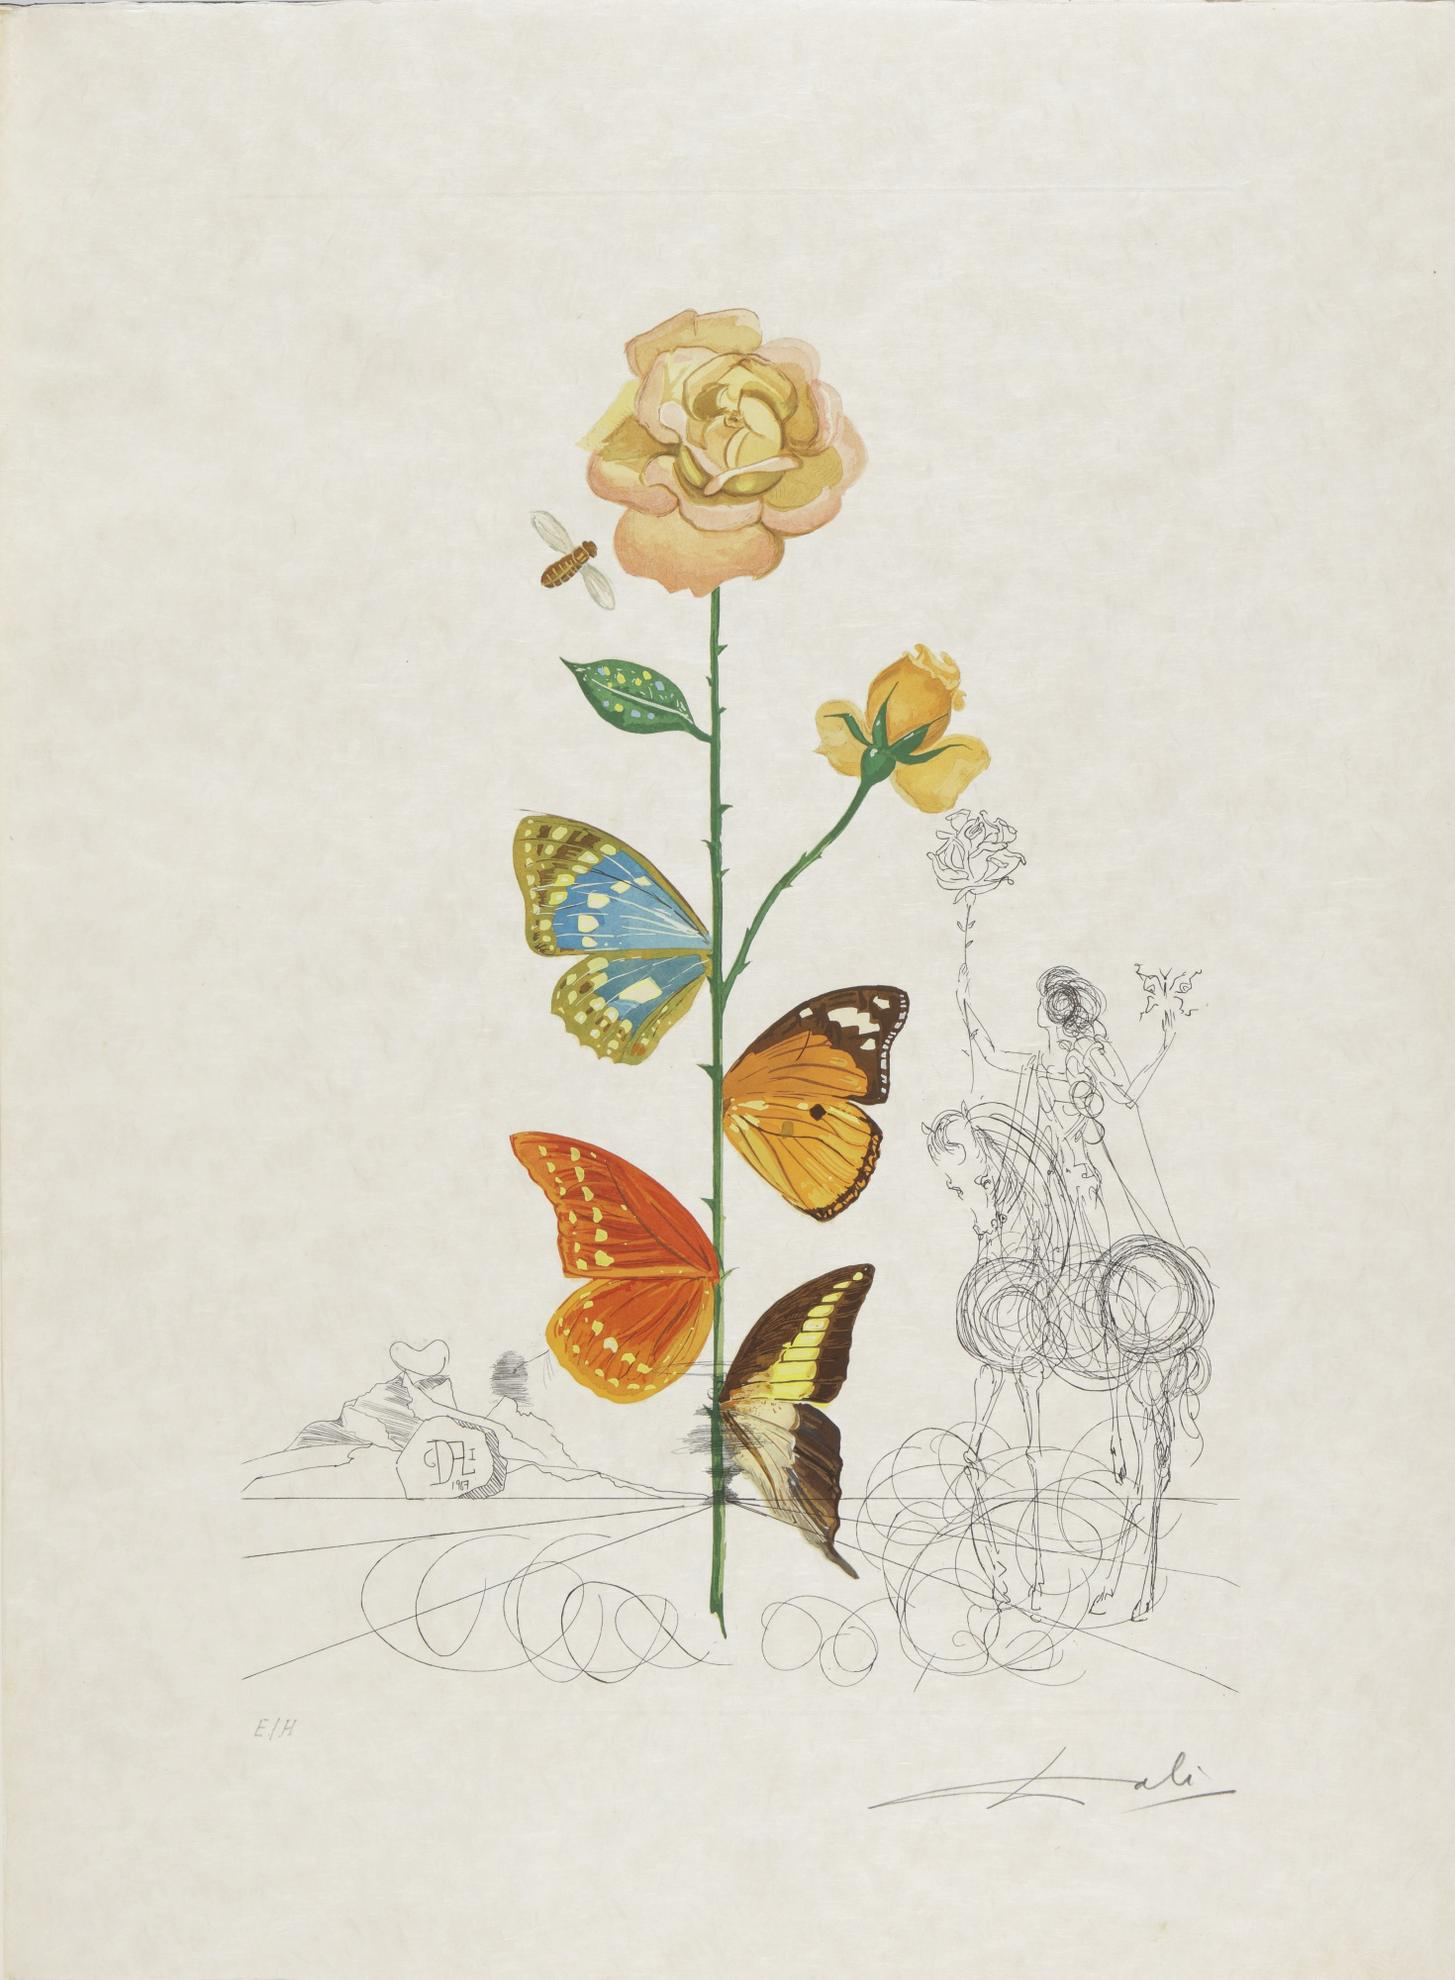 Salvador Dali-Flora Dalinae (Michler & Lopsinger 227-236; Field 68-3 A-J)-1968